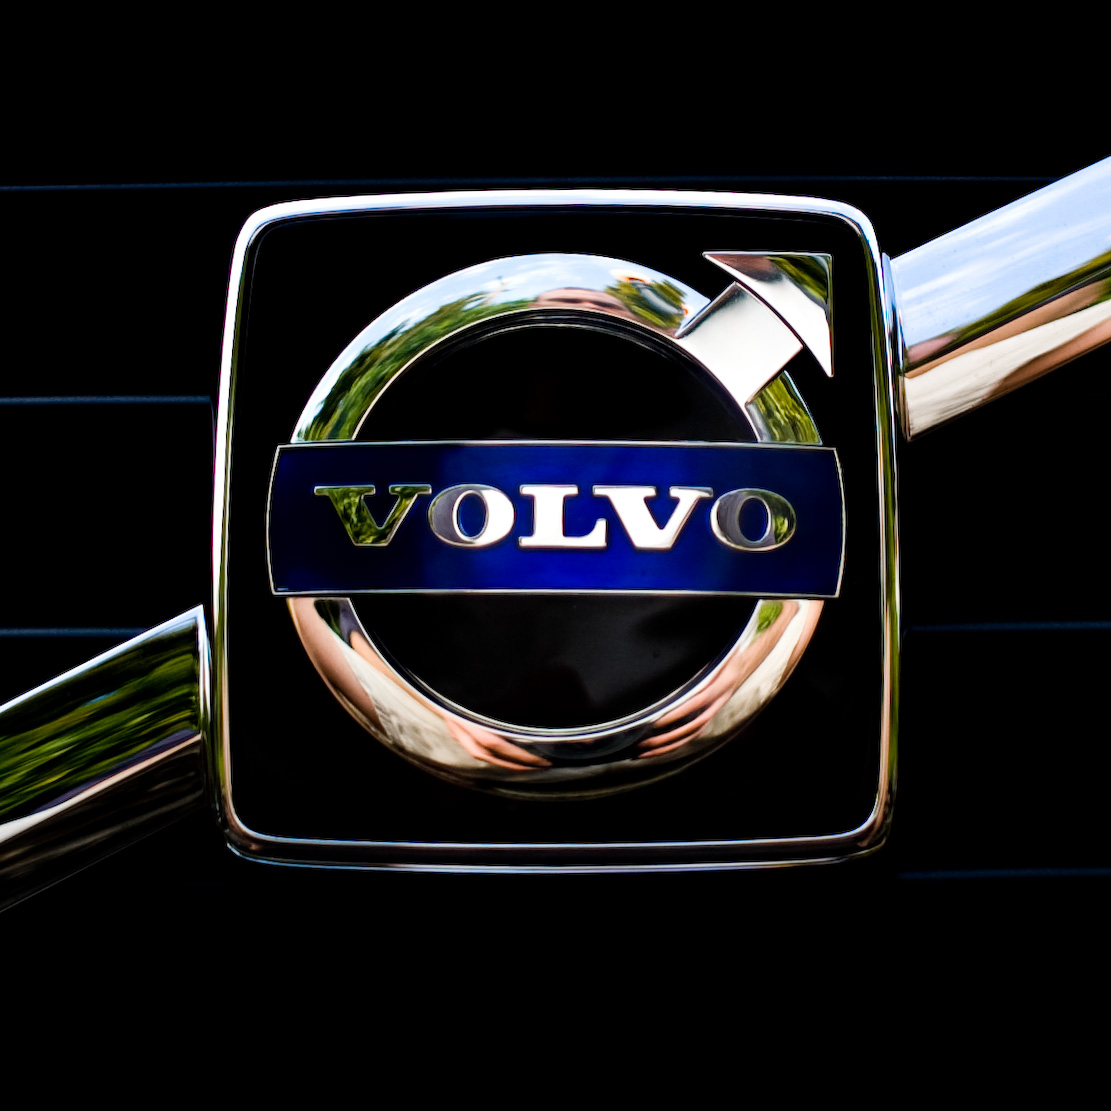 Volvo Symbol Wallpaper